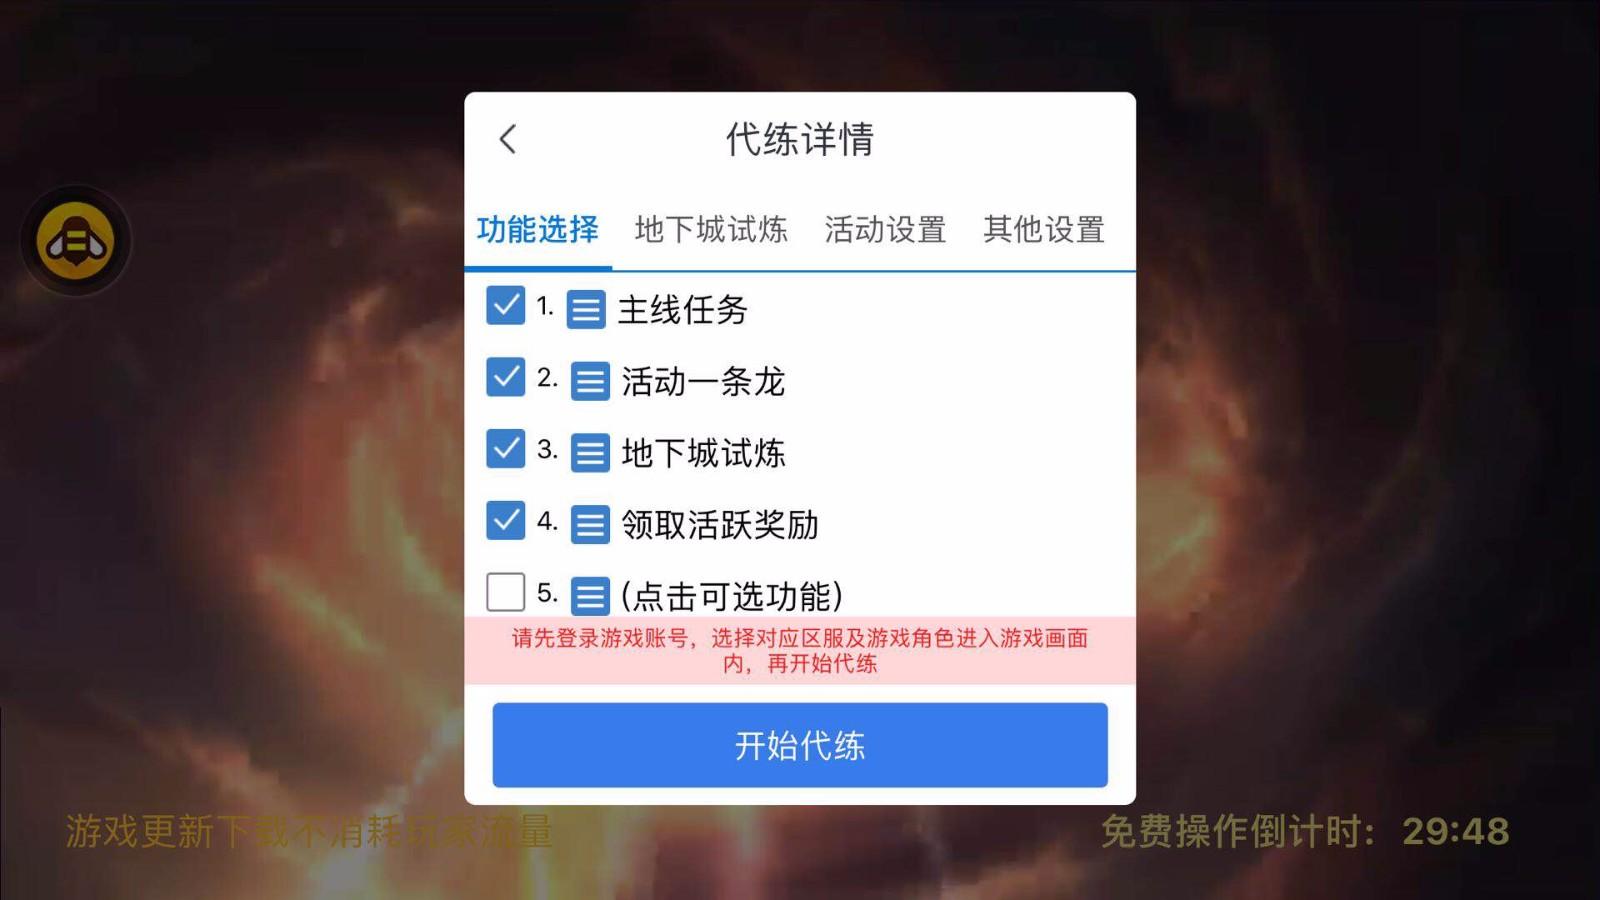 QQ华夏手游ios辅助苹果免越狱版V1.0 苹果版